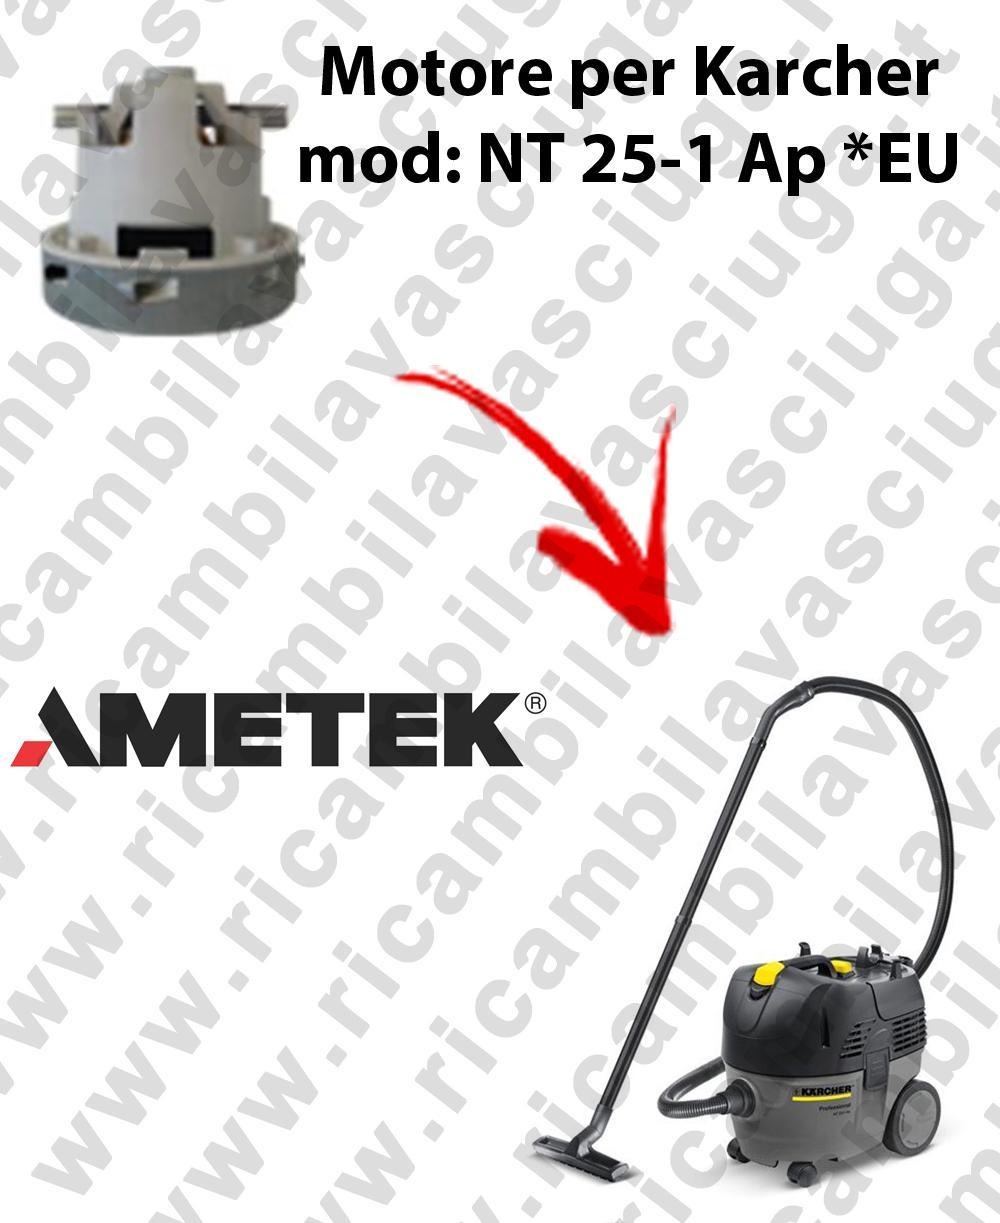 NT 25-1 Ap * EU  Saugmotor AMETEK für Staubsauger KARCHER